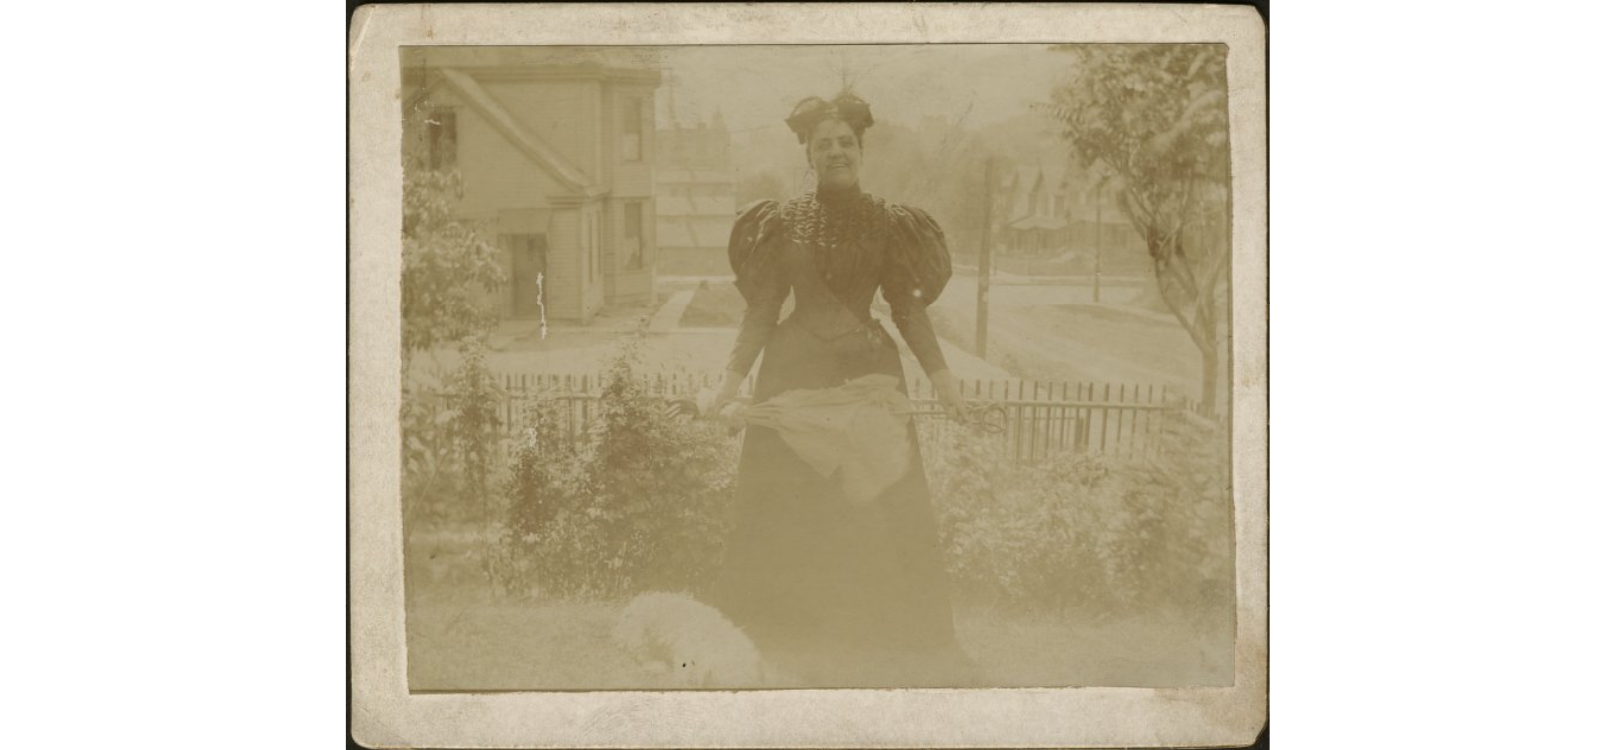 Mary Elizabeth (Weaver) Epperson